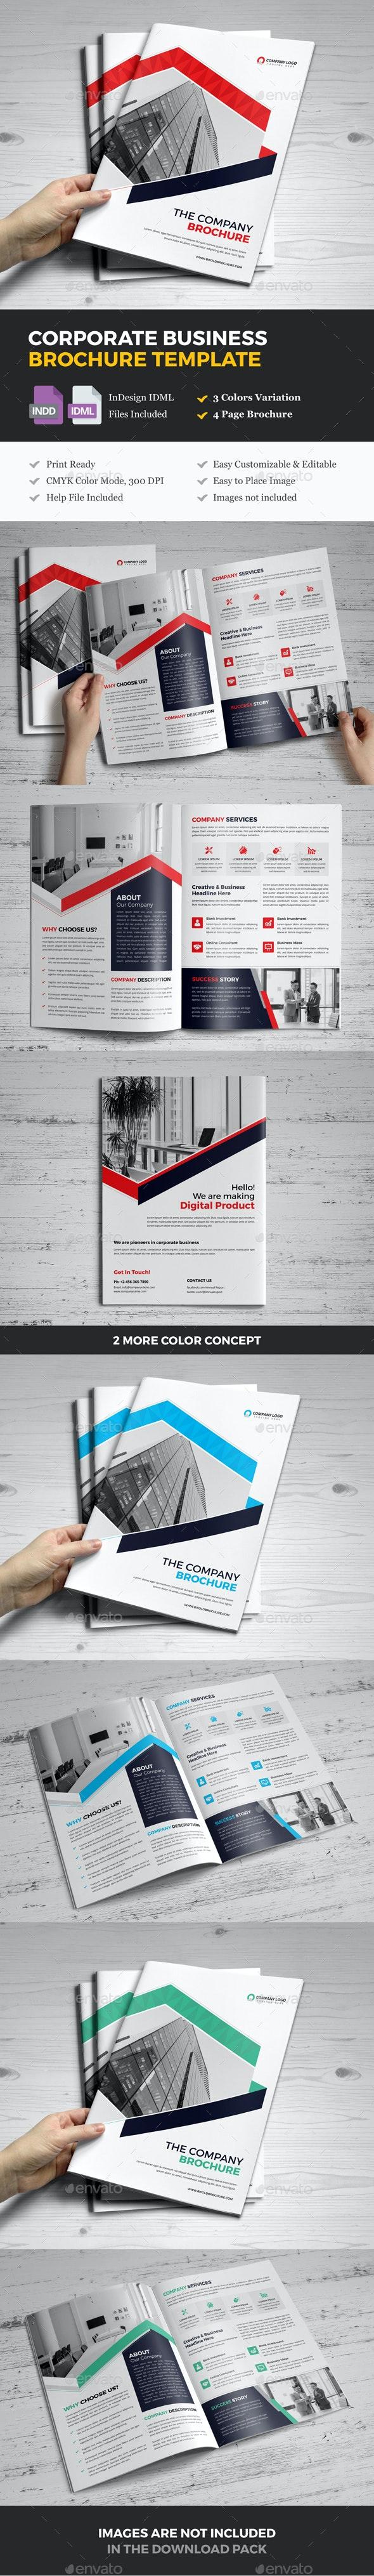 Company Business Brochure Template v10 - Corporate Brochures